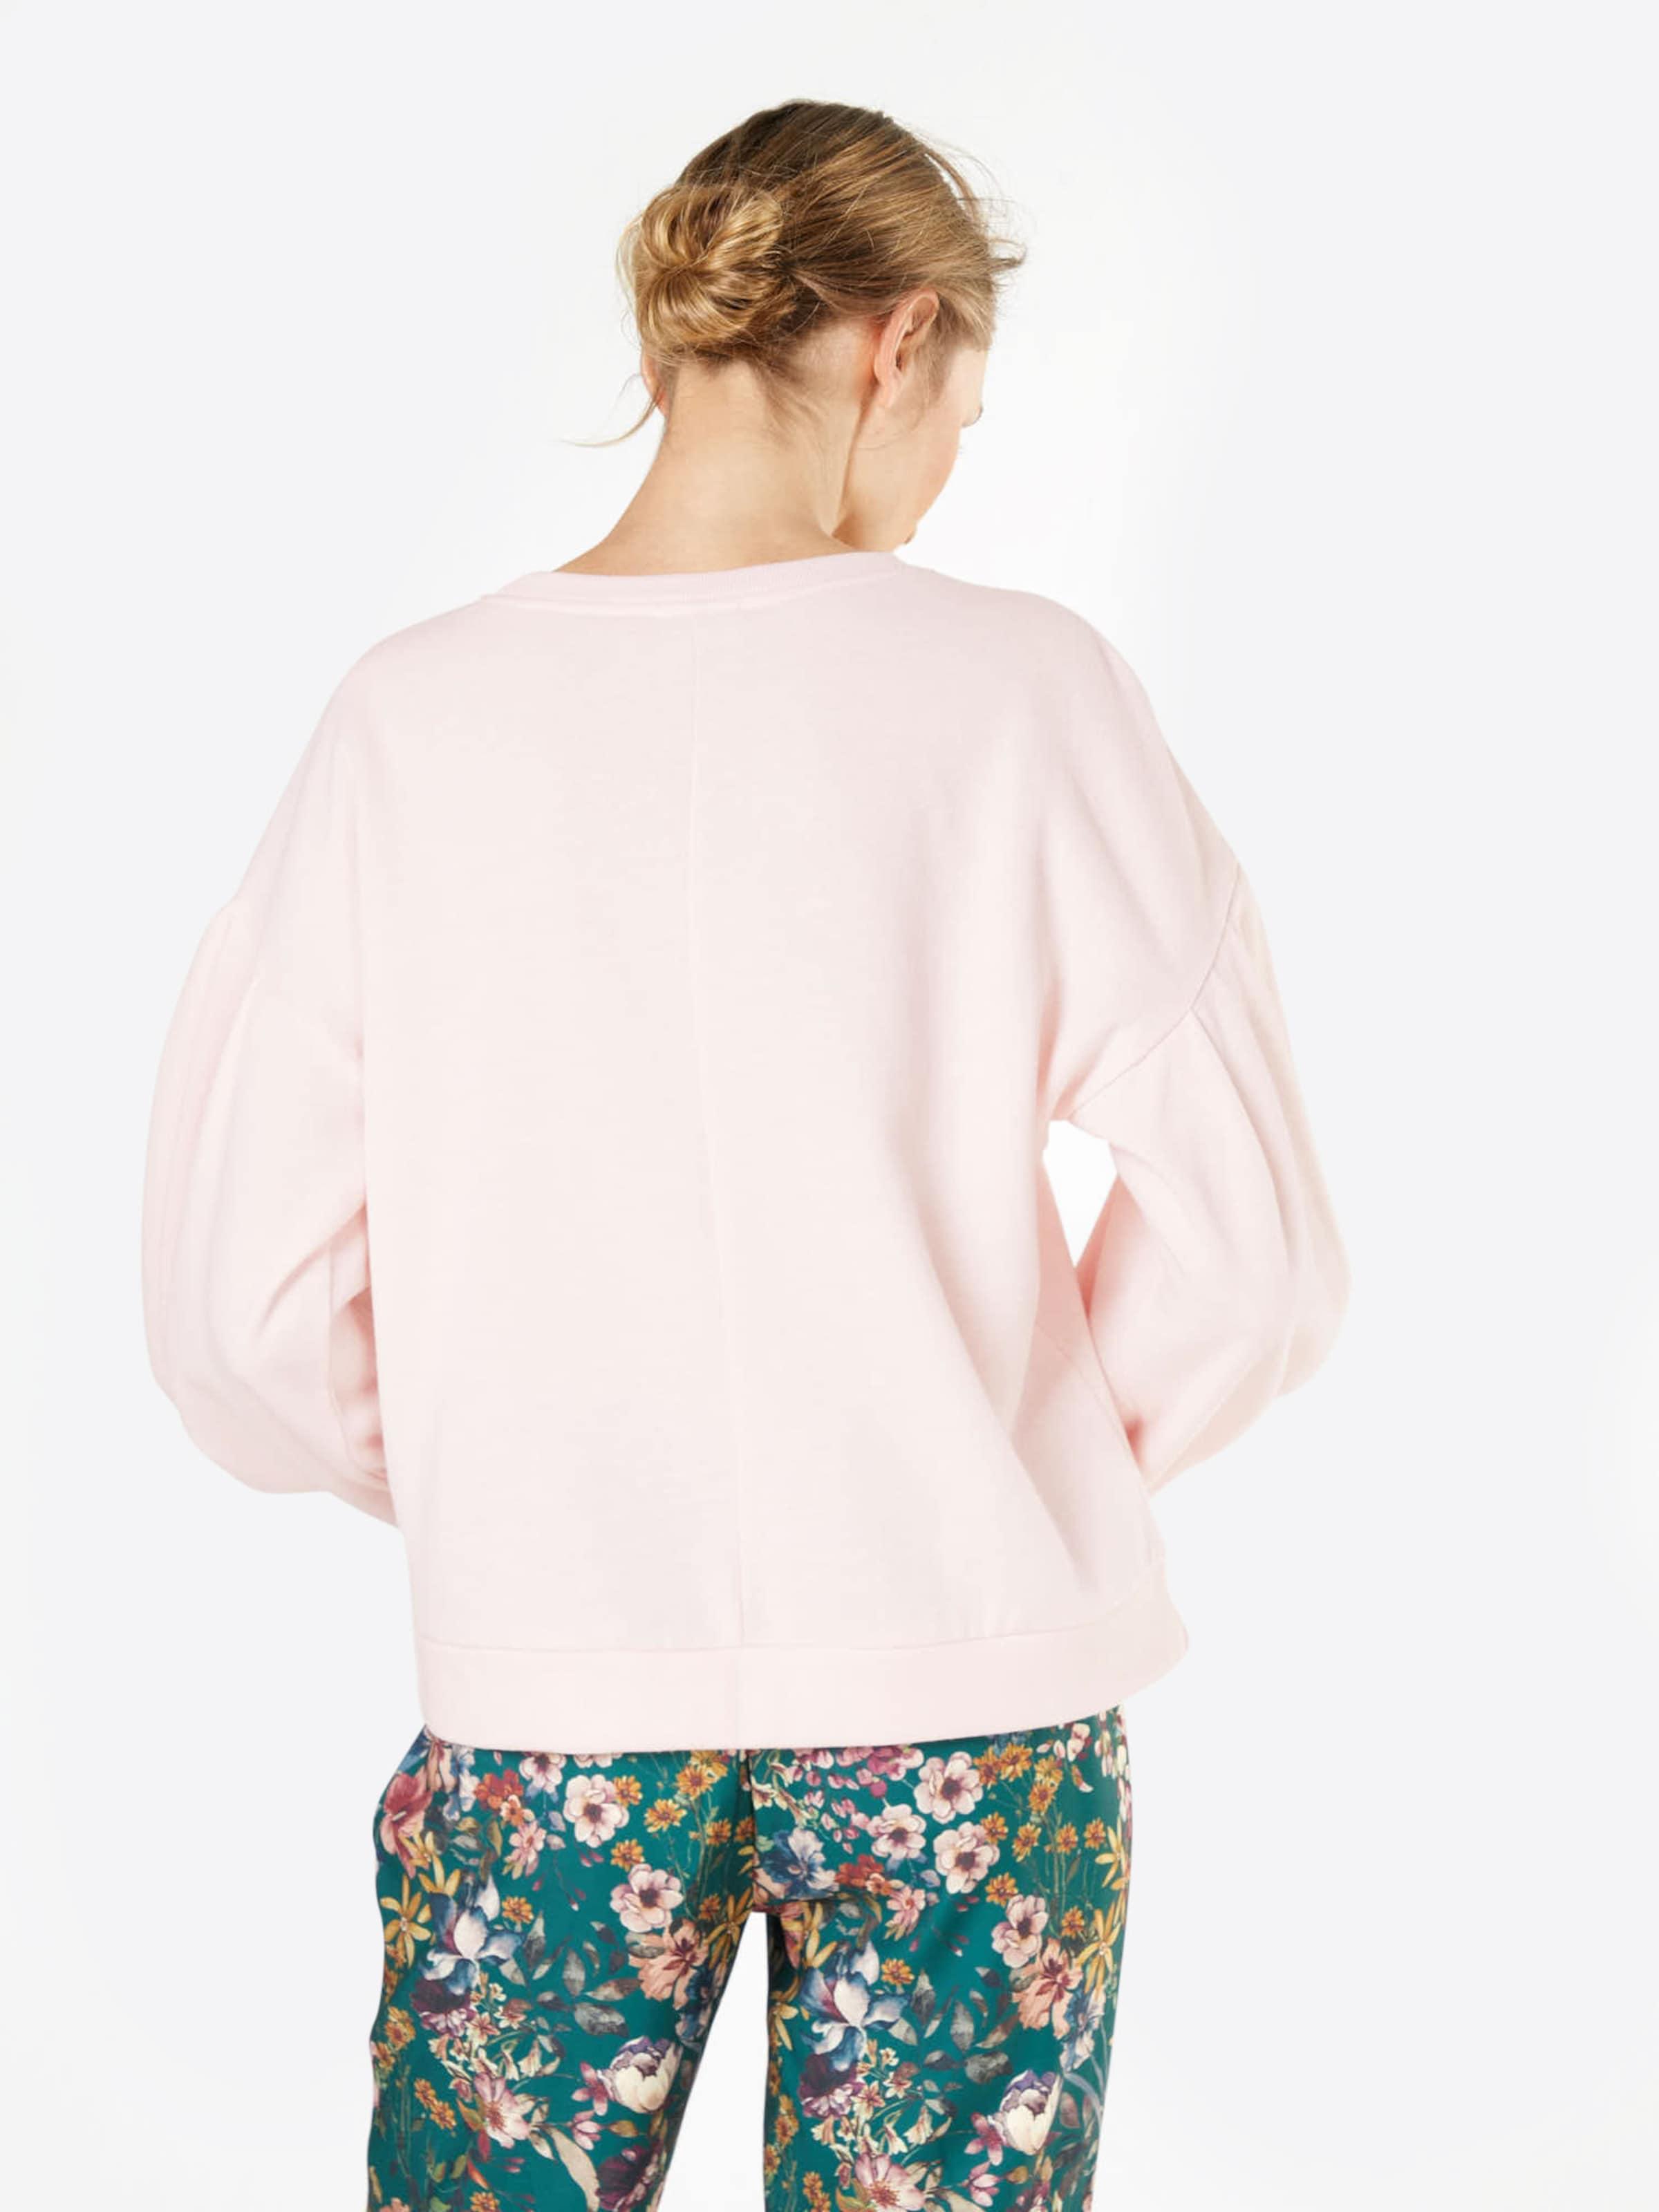 In Noisy Sweater May Rosa 'loui' 5j4ARL